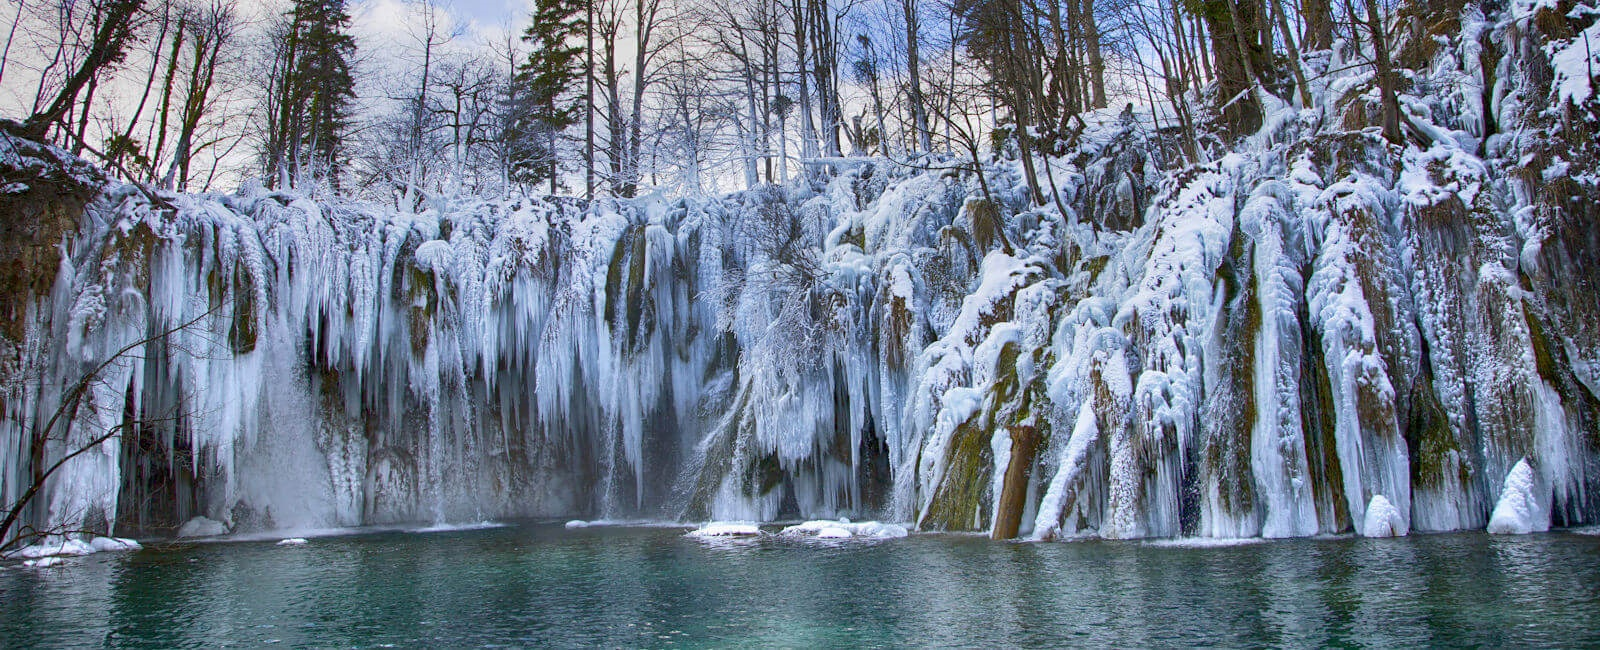 holidays to plitvice lakes, croatia